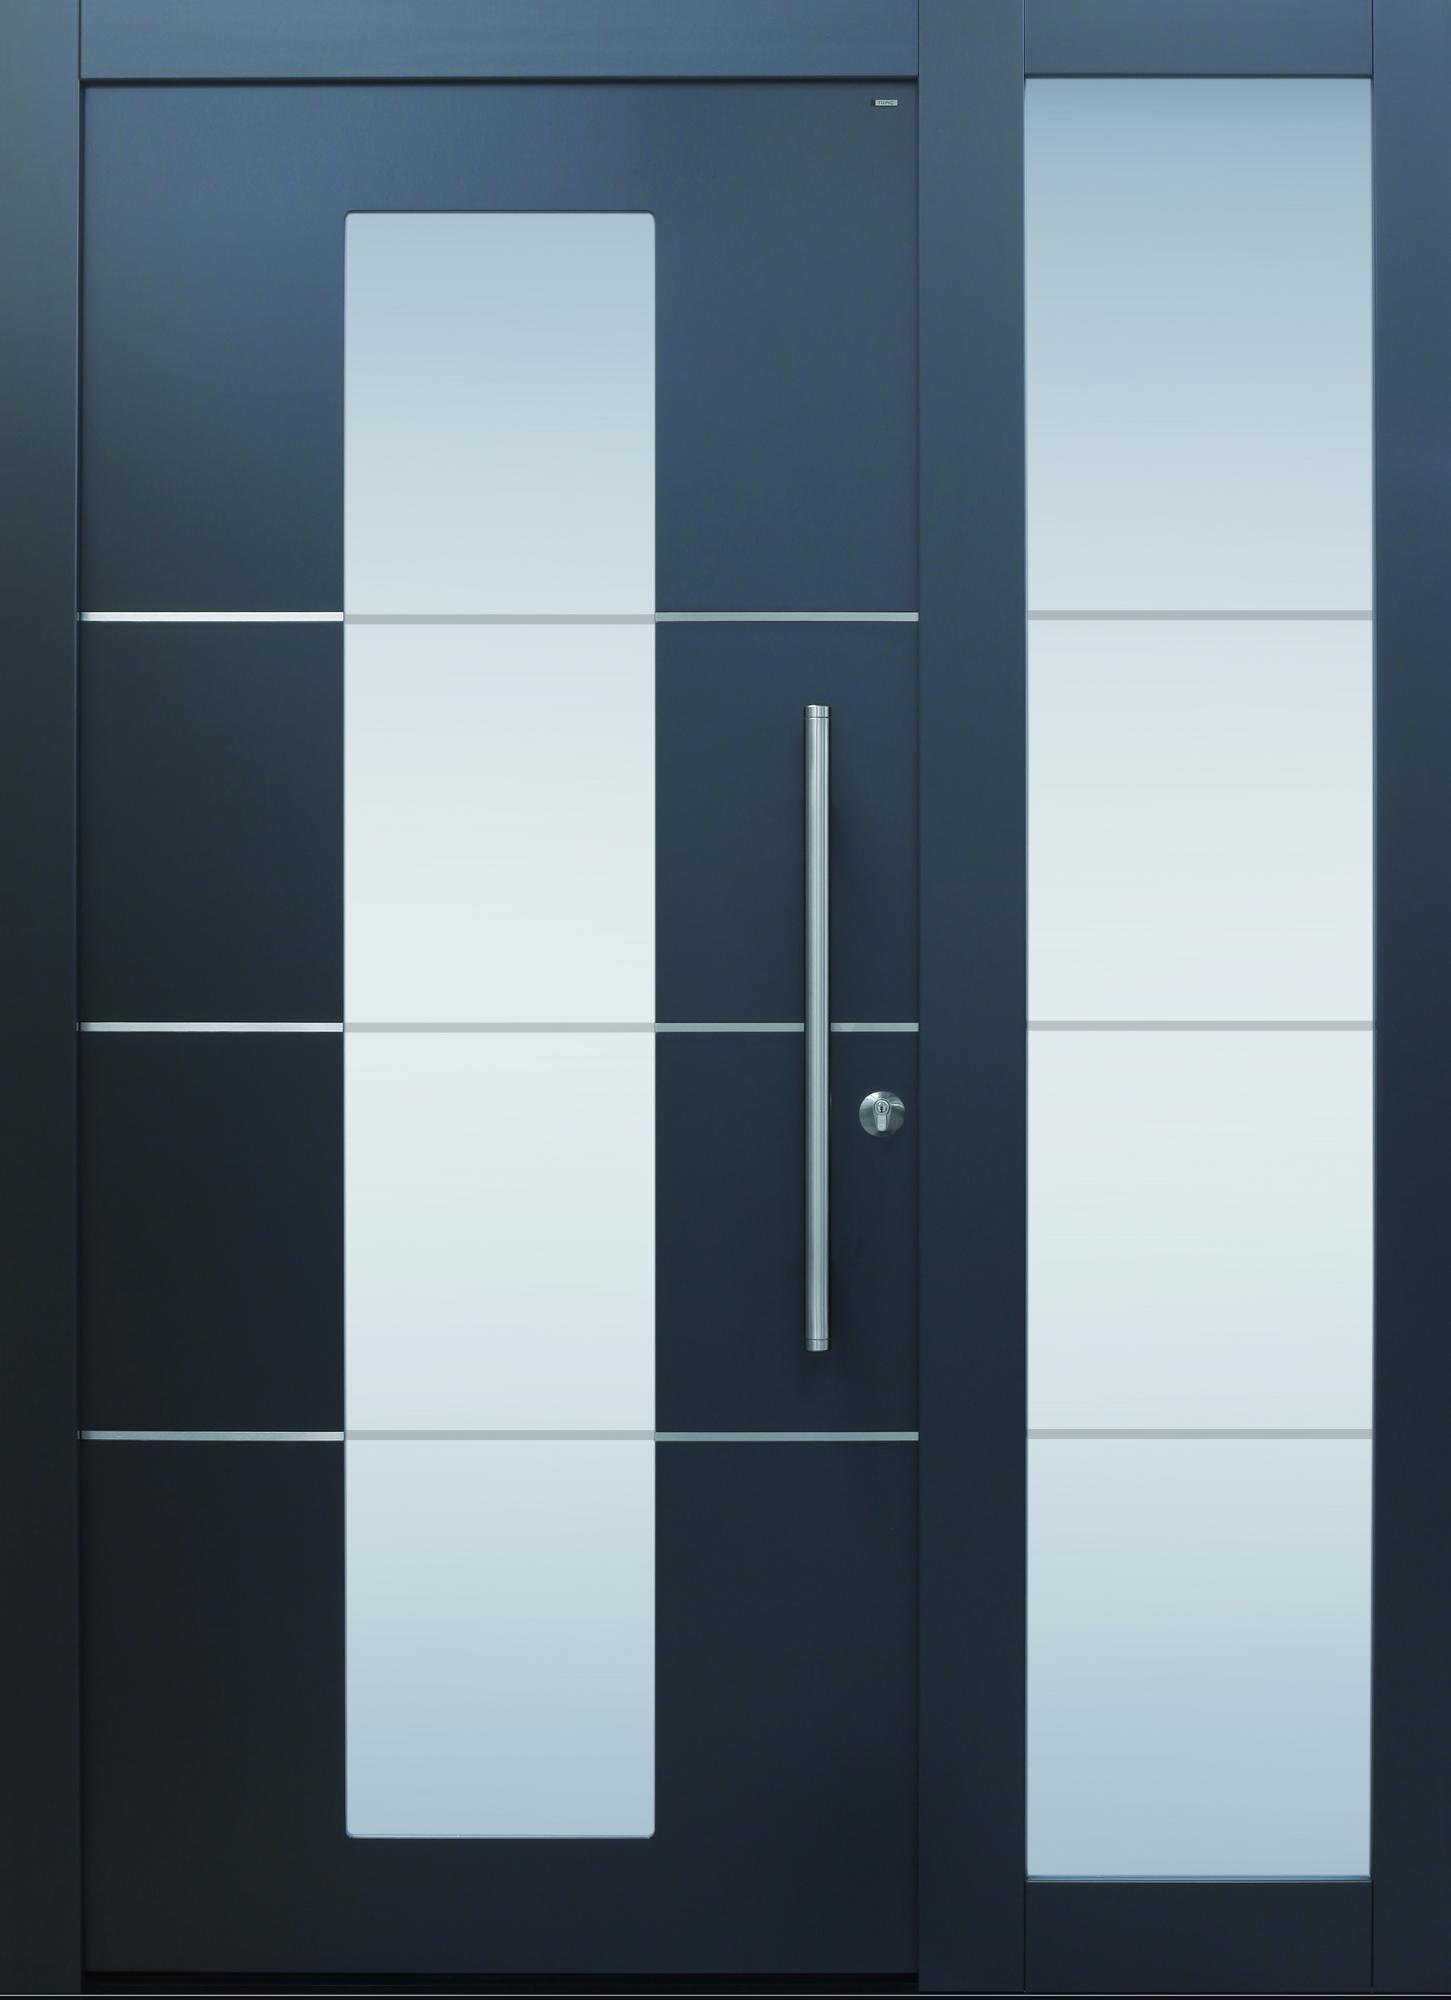 haustr glas figure with haustr glas awesome dura glasvordach mit ovaler profilform with haustr. Black Bedroom Furniture Sets. Home Design Ideas